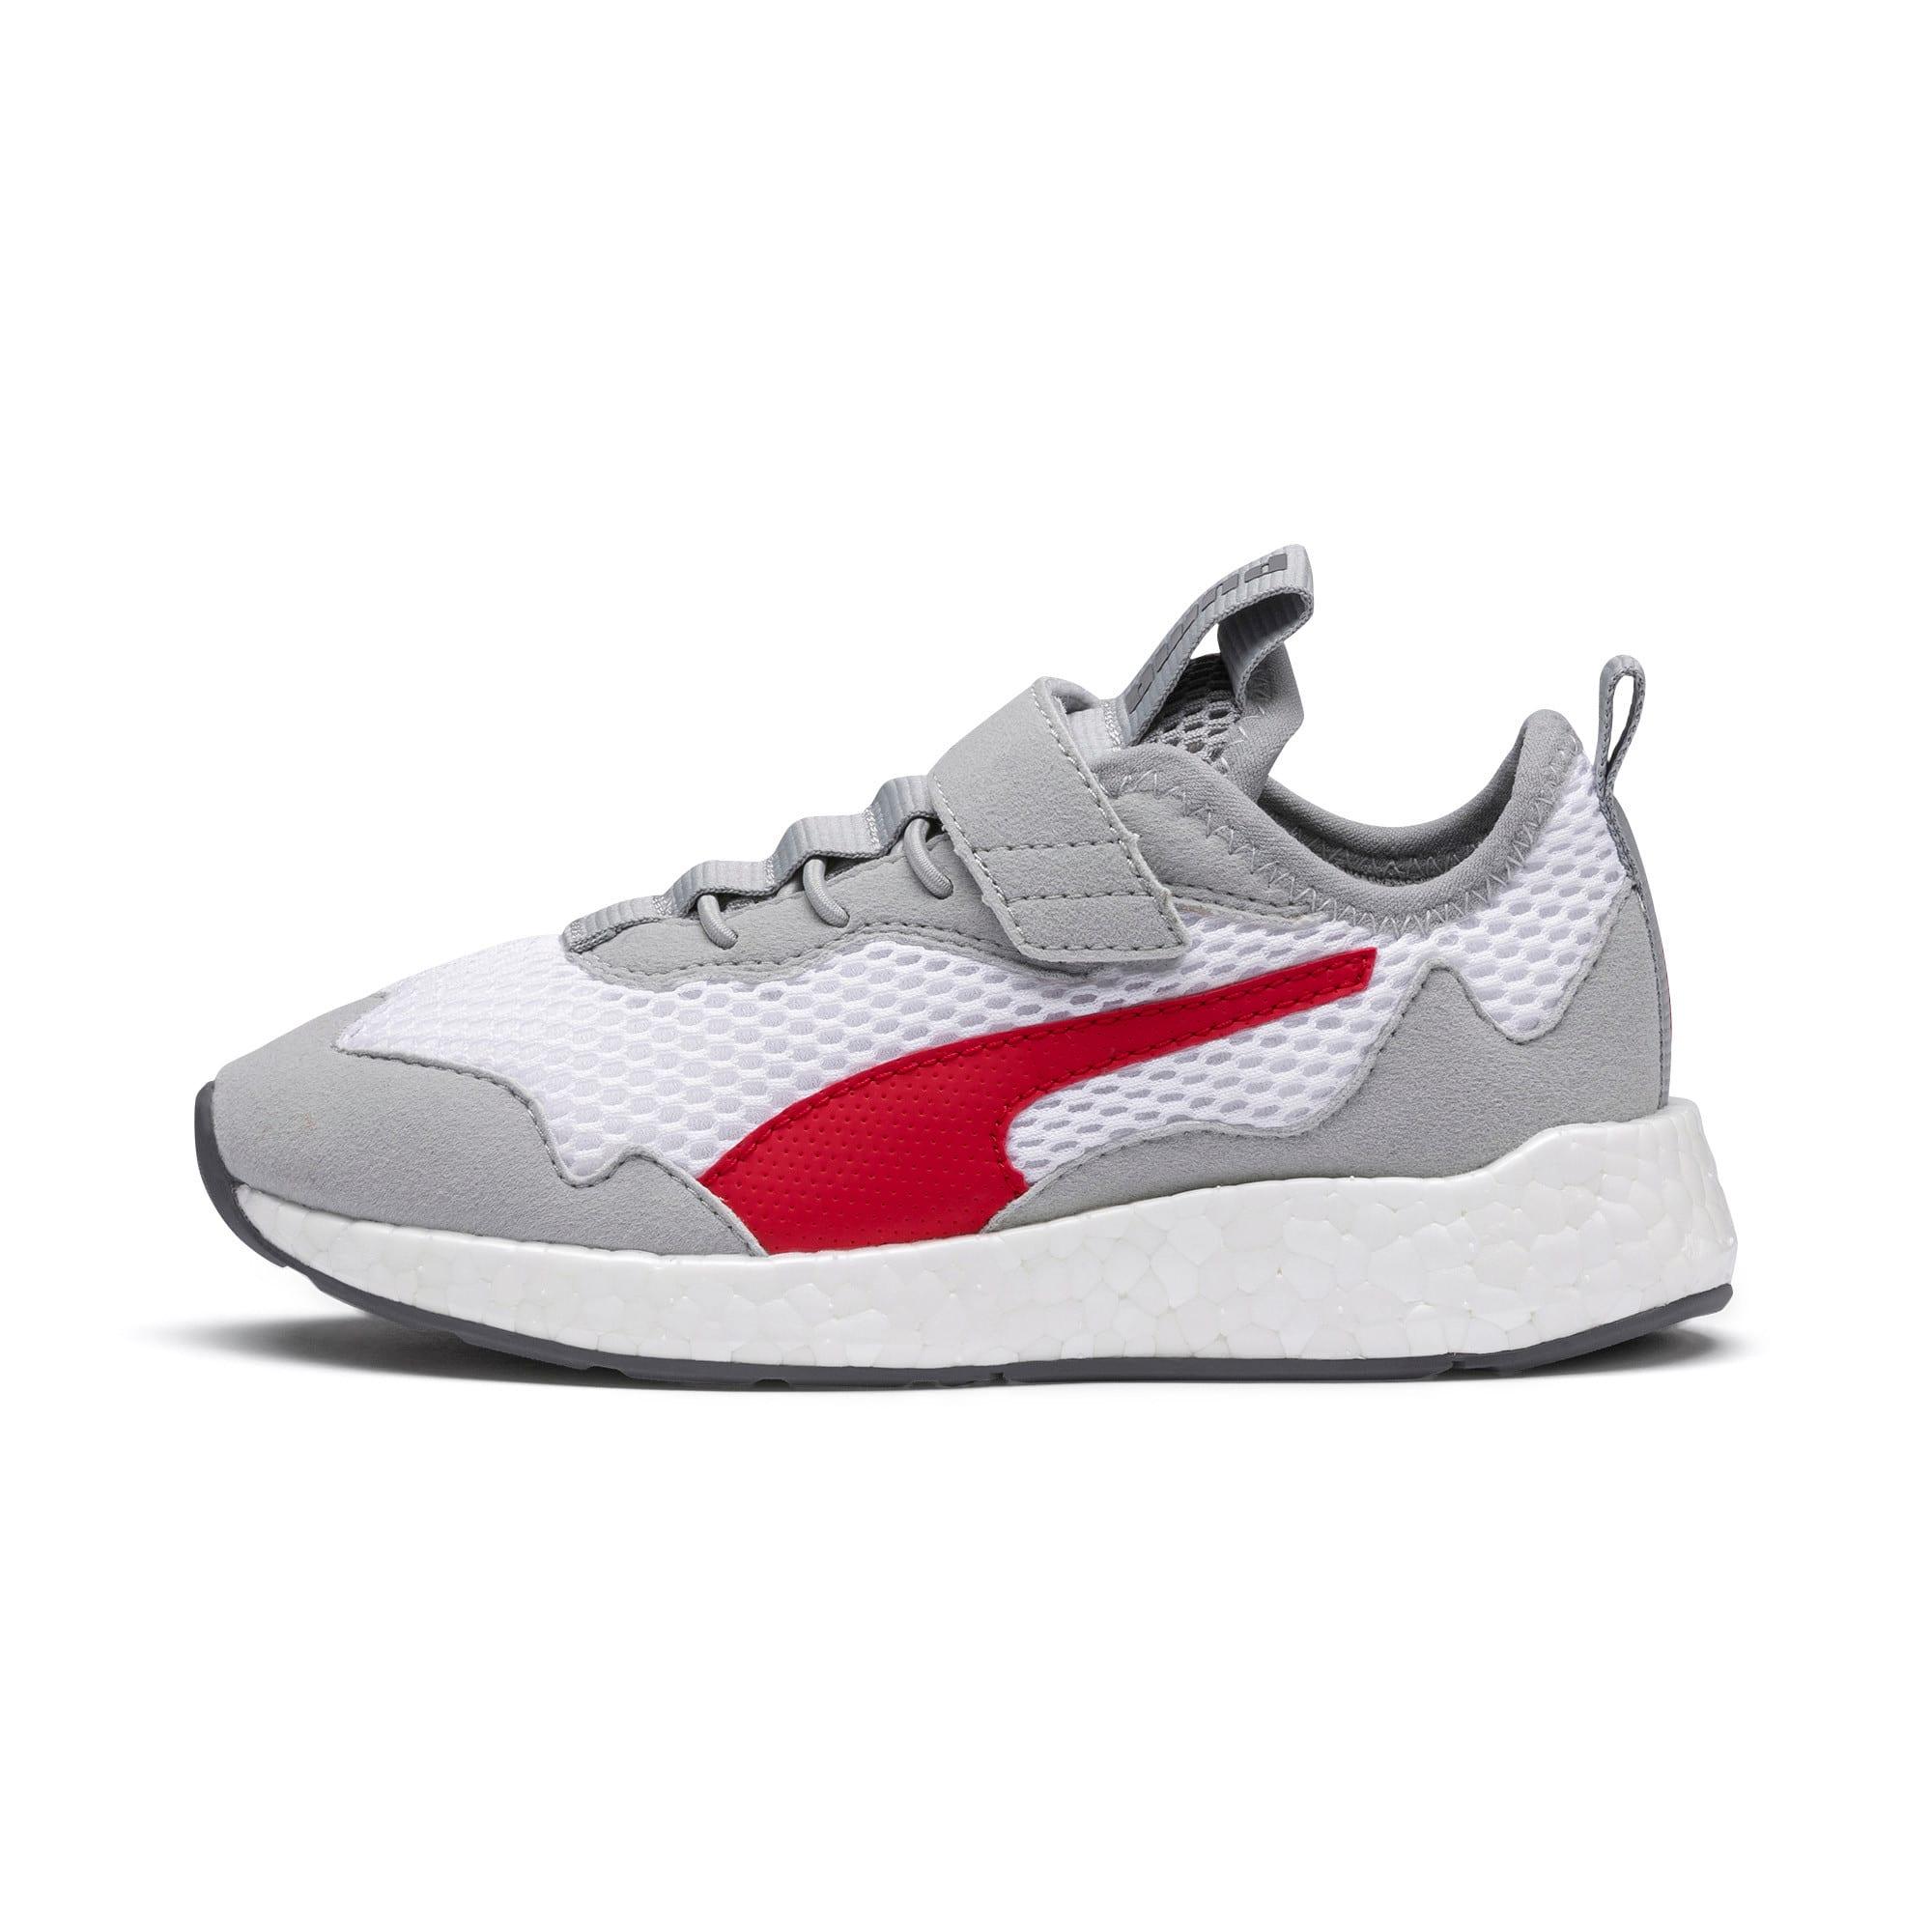 Thumbnail 1 of NRGY Neko Skim AC Shoes PS, White-H Rise-CASTLEROCK-Red, medium